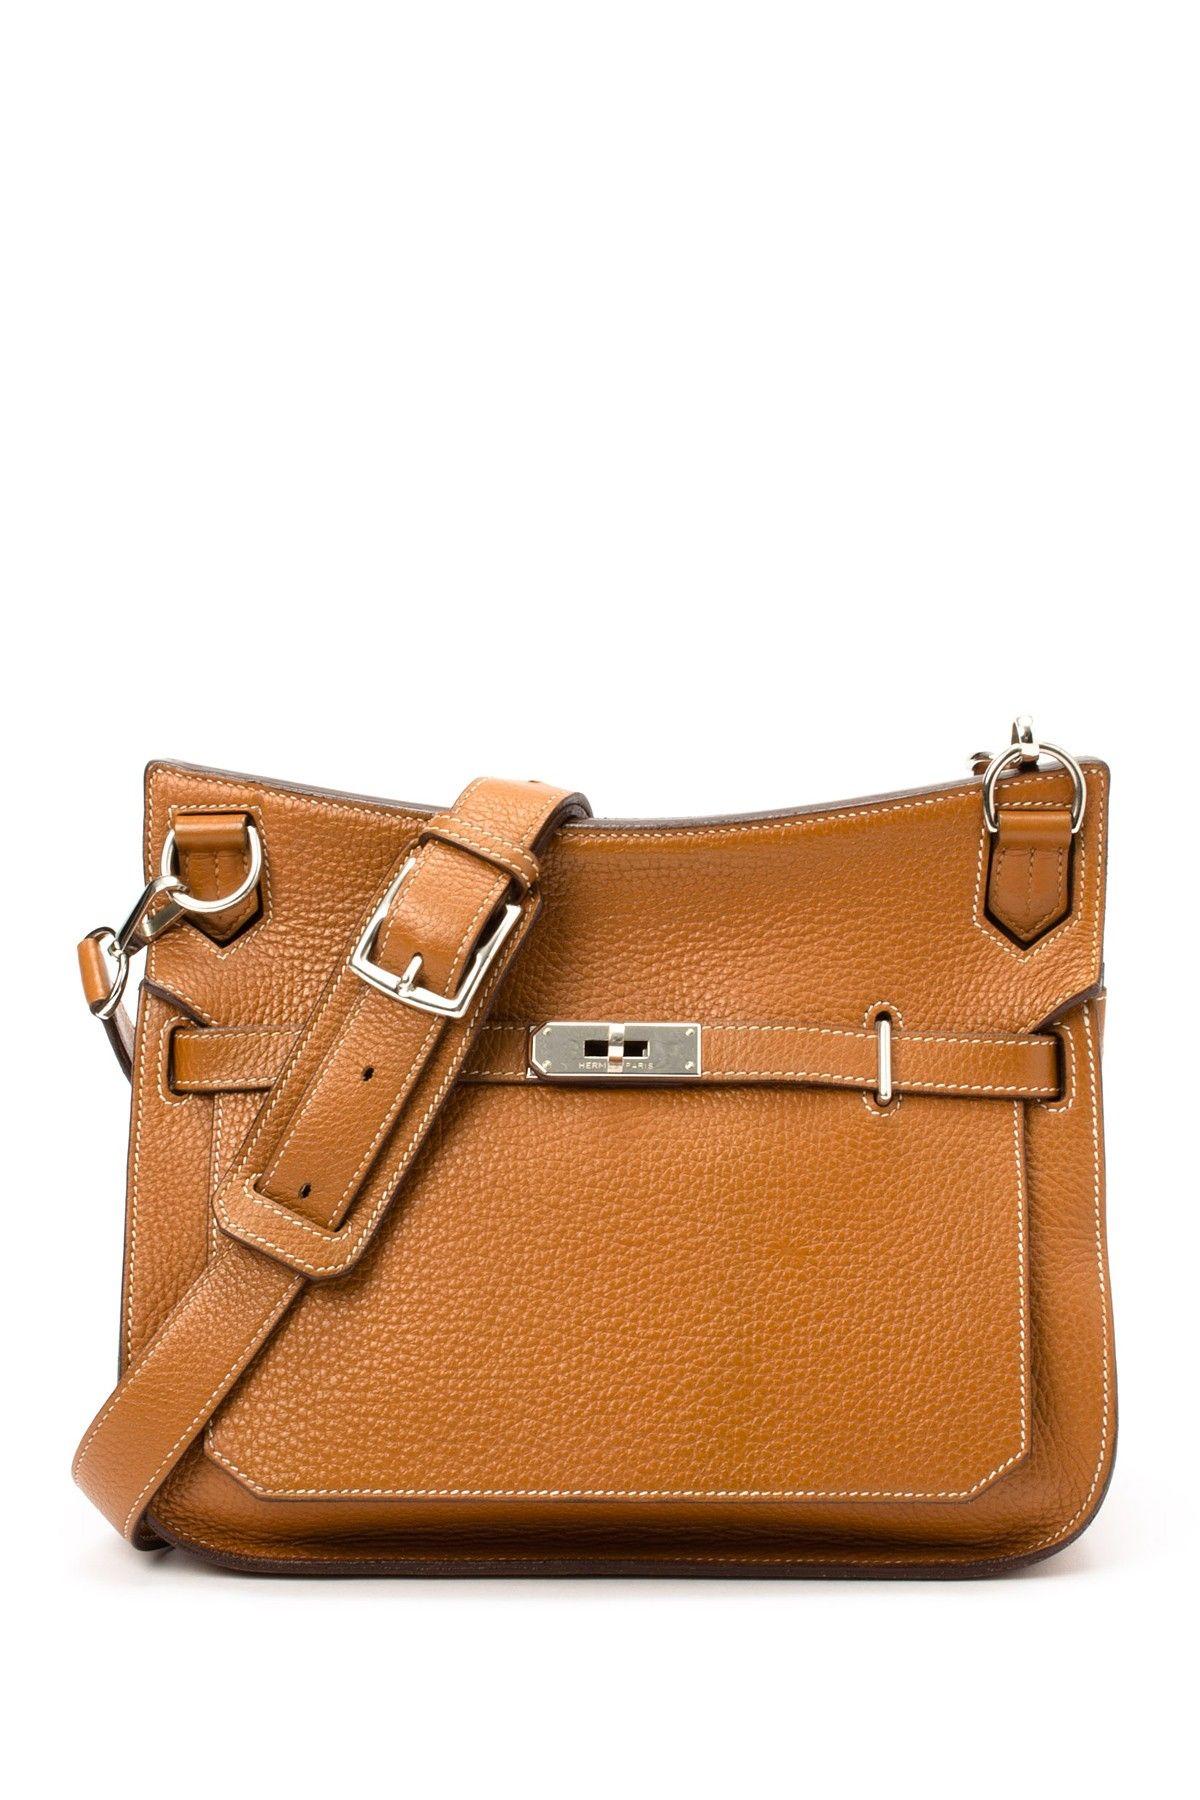 0550565c11ab hot vintage hermes bag just a dream. c15d5 5b157